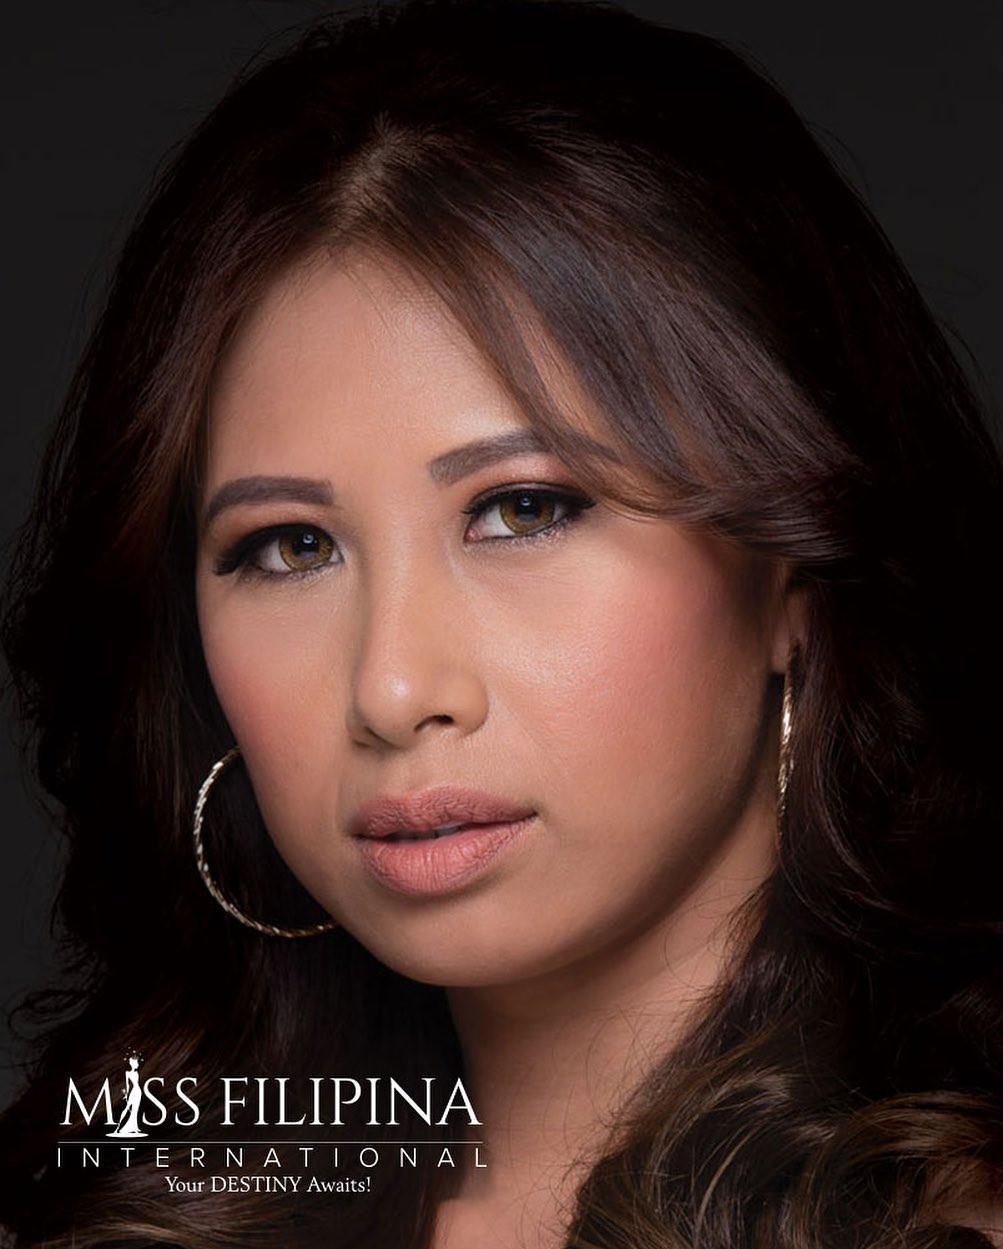 candidatas a miss filipina international 2021. final: 31 july. - Página 2 A5qOsS